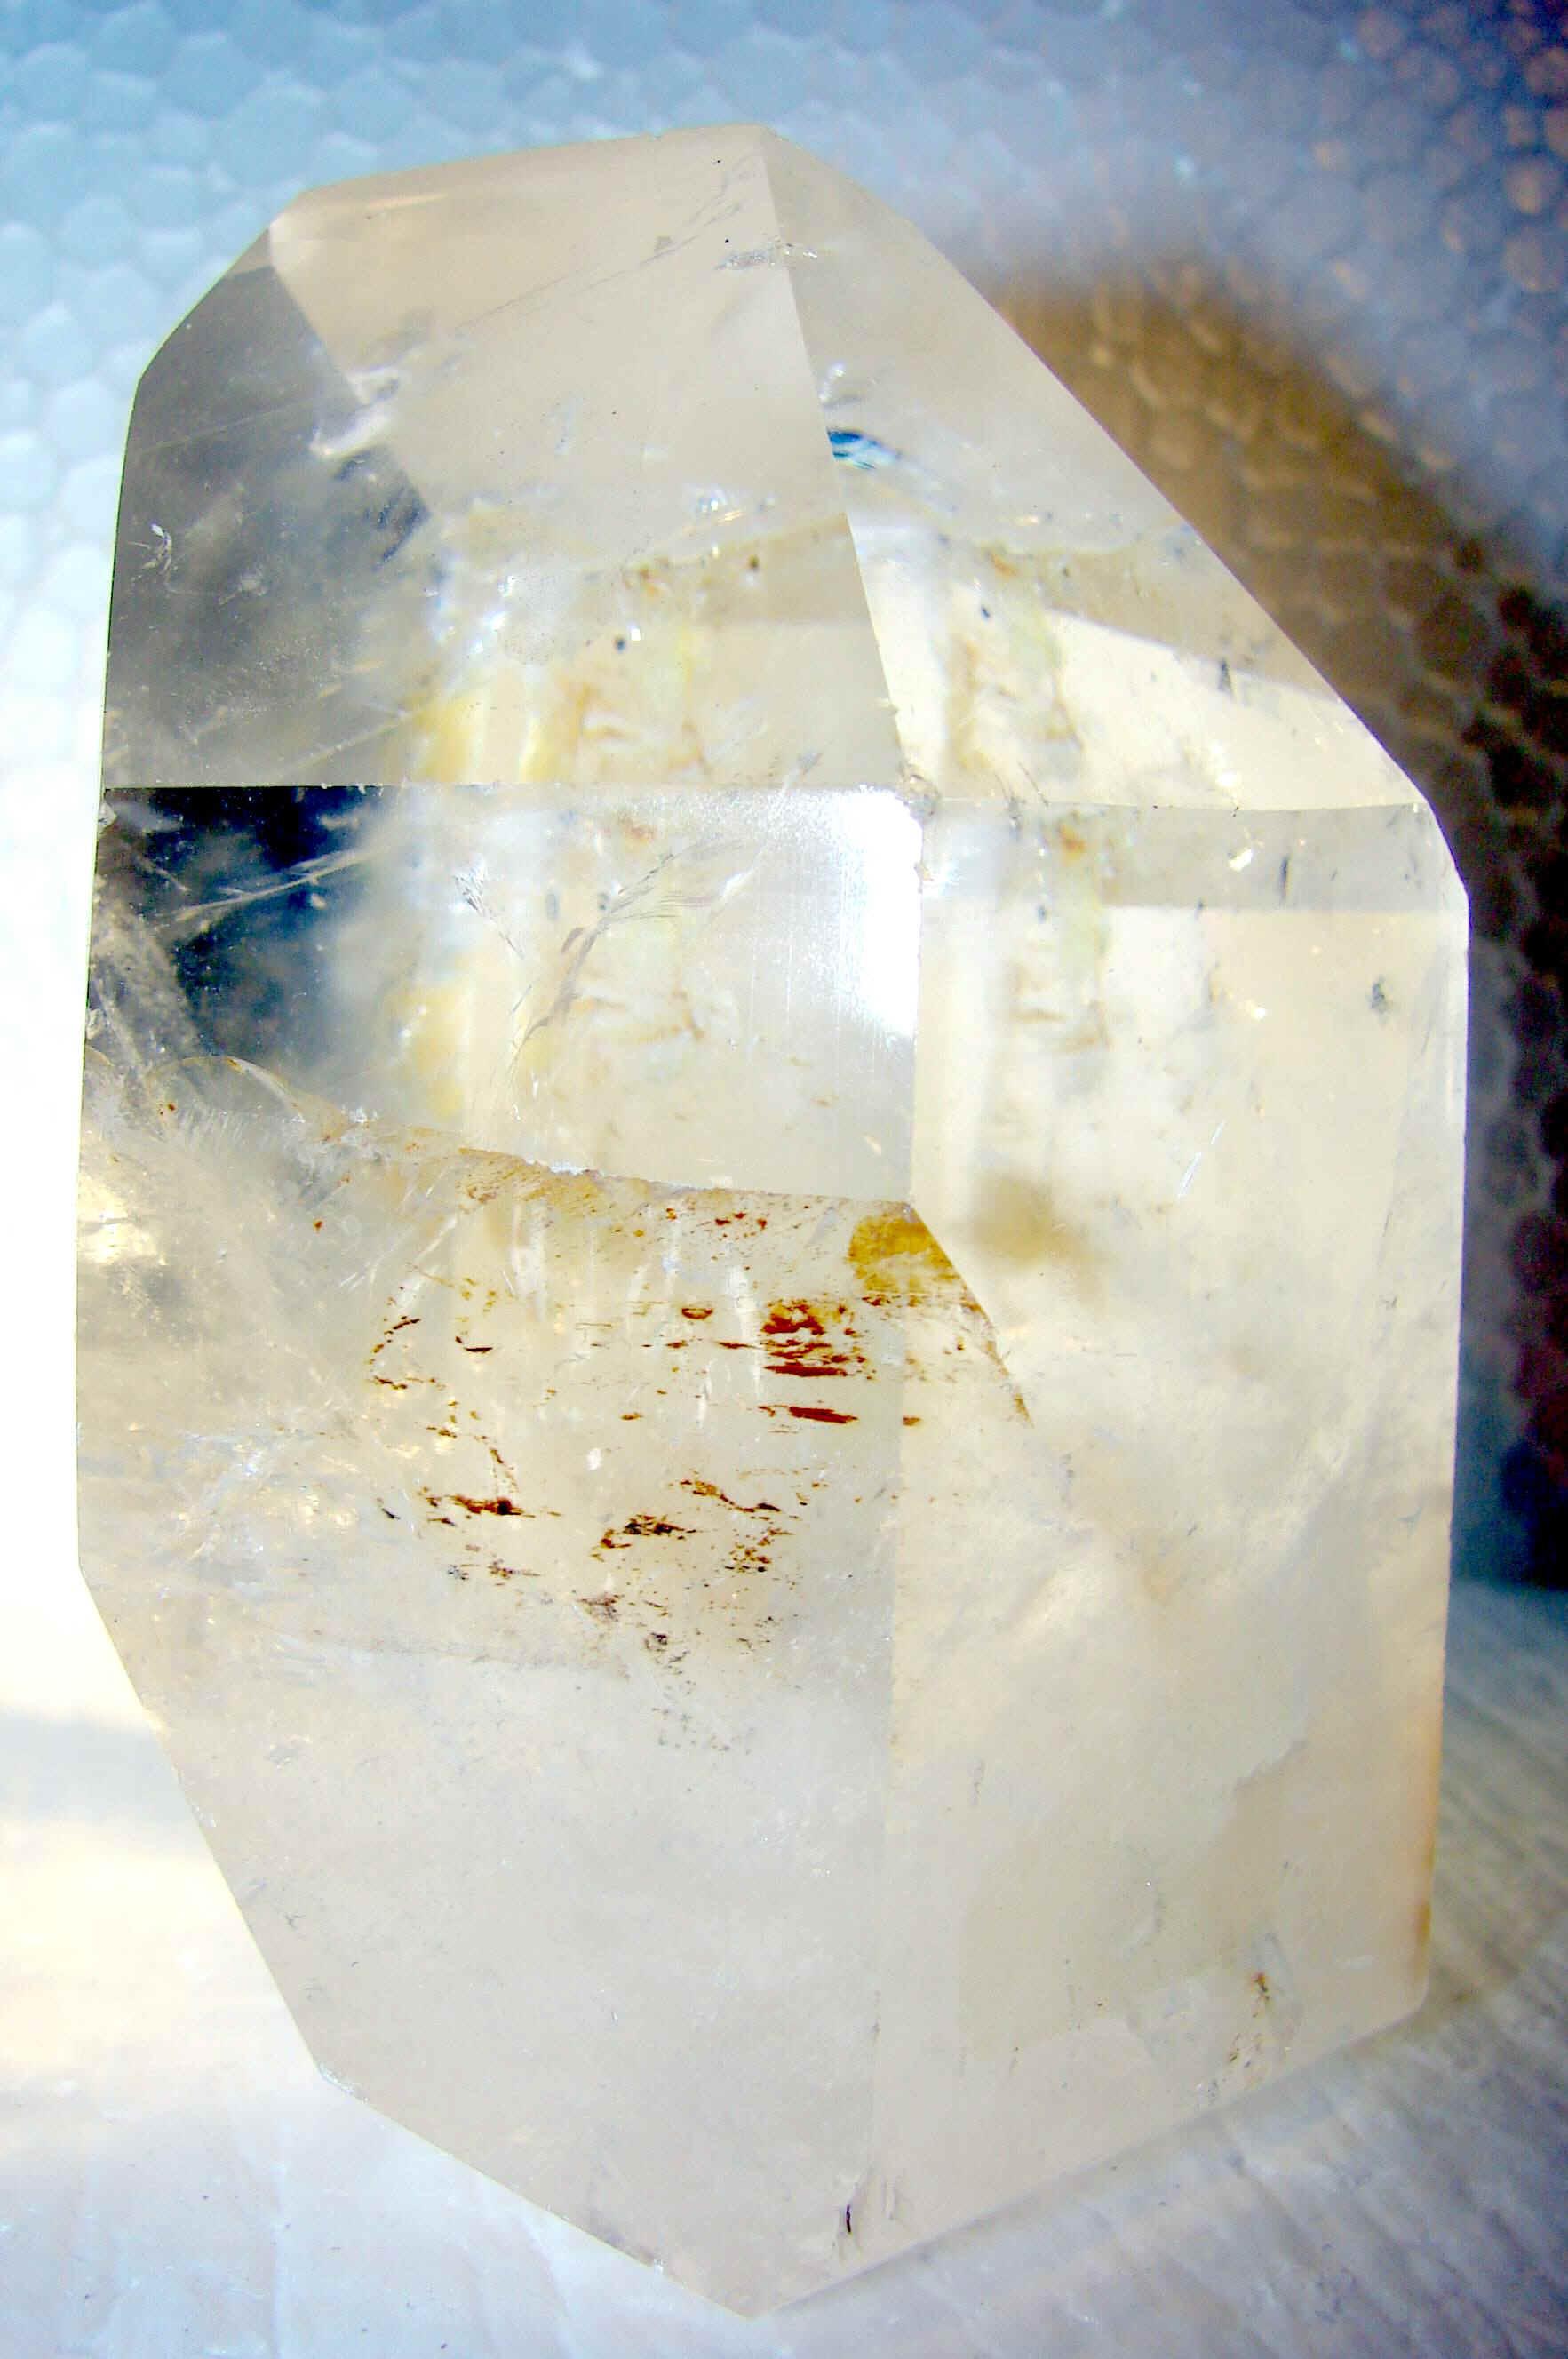 http://www.quartzcrystals.net/nuxl-20.jpg (807370 bytes)